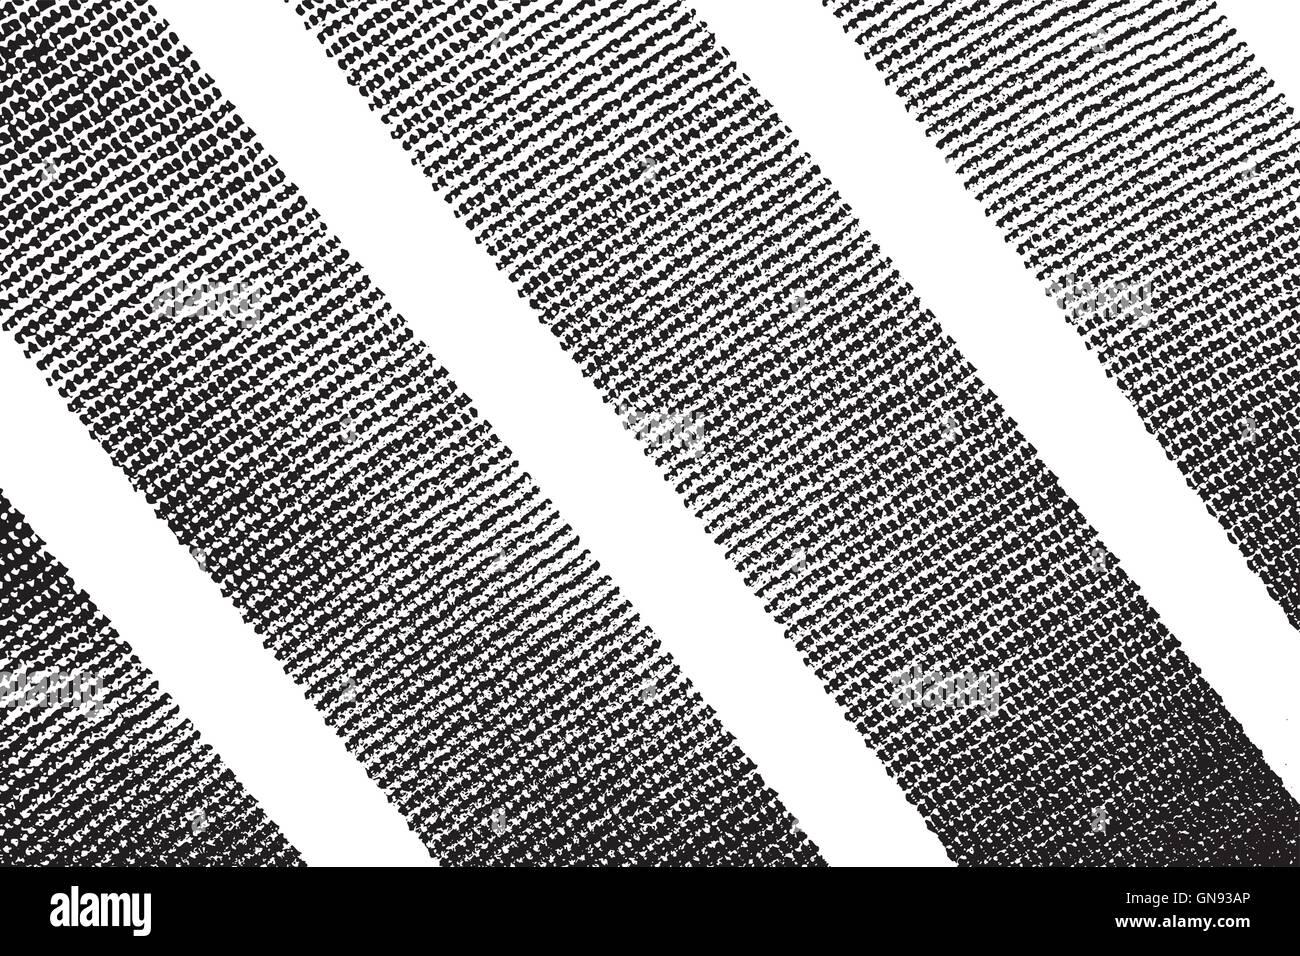 Vector Cracked Texture . Distress Texture . Grunge Texture . Vector Dirt Texture . Overlay Texture - Stock Image